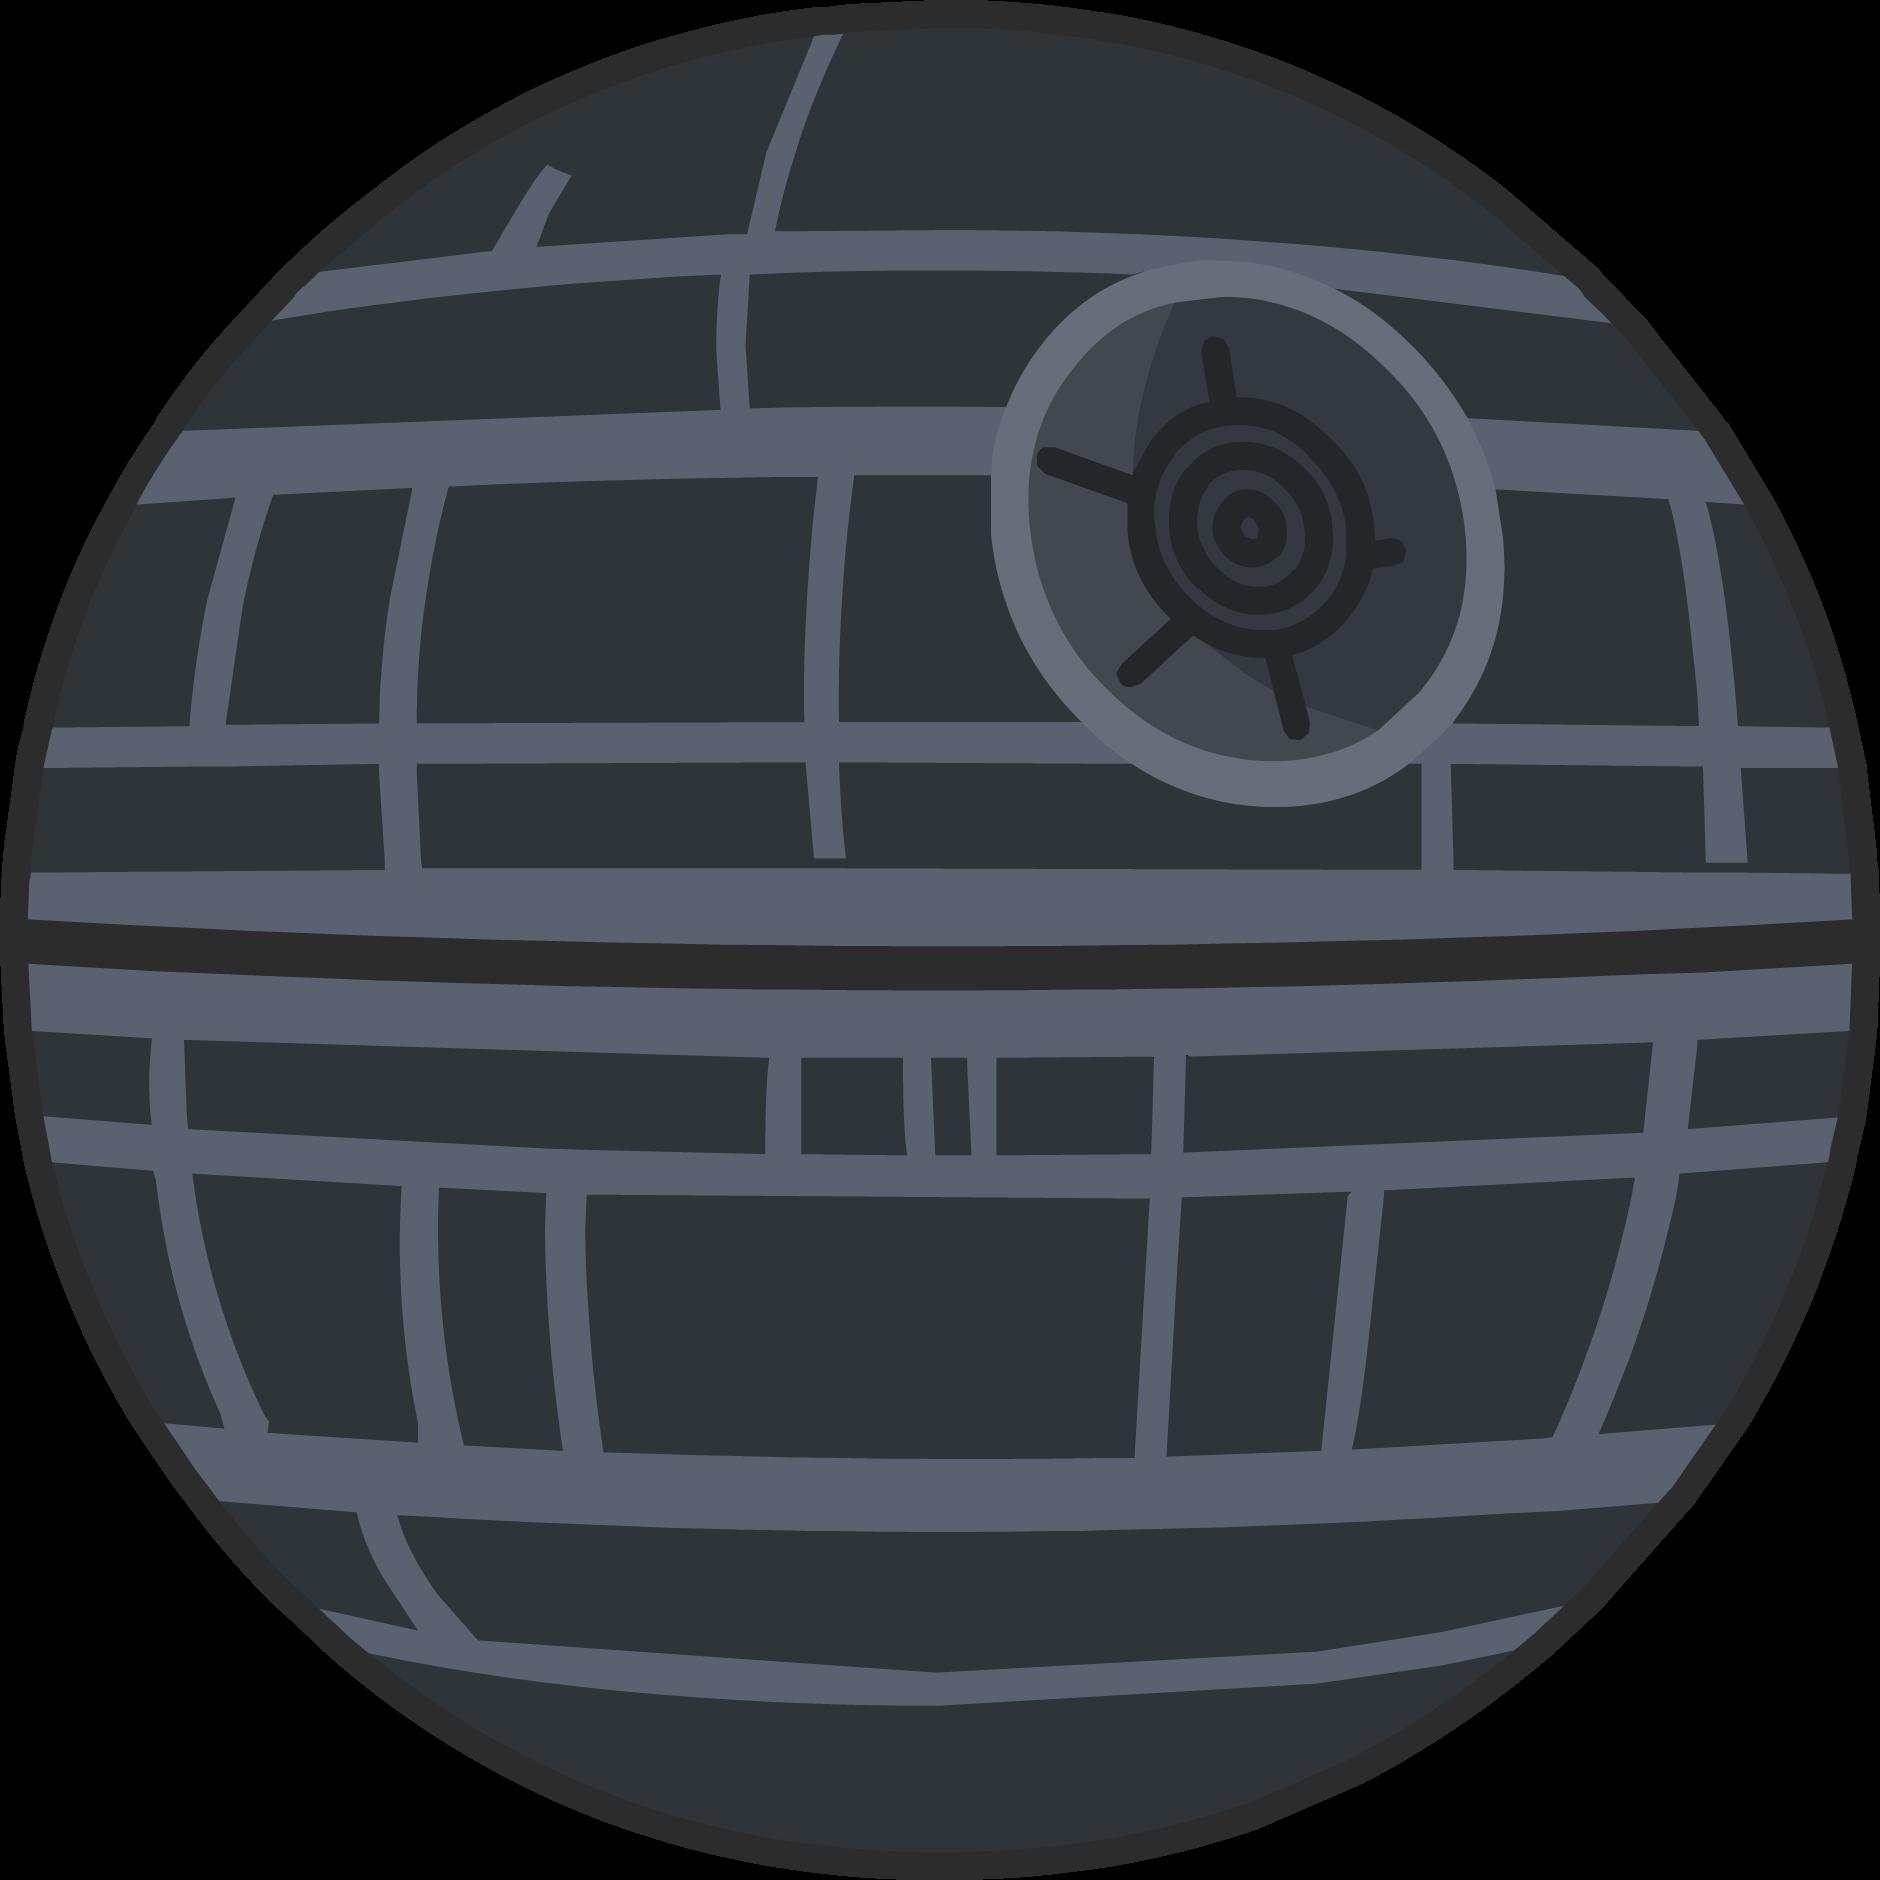 Death Star Club Penguin Wiki Fandom Powered By Wikia